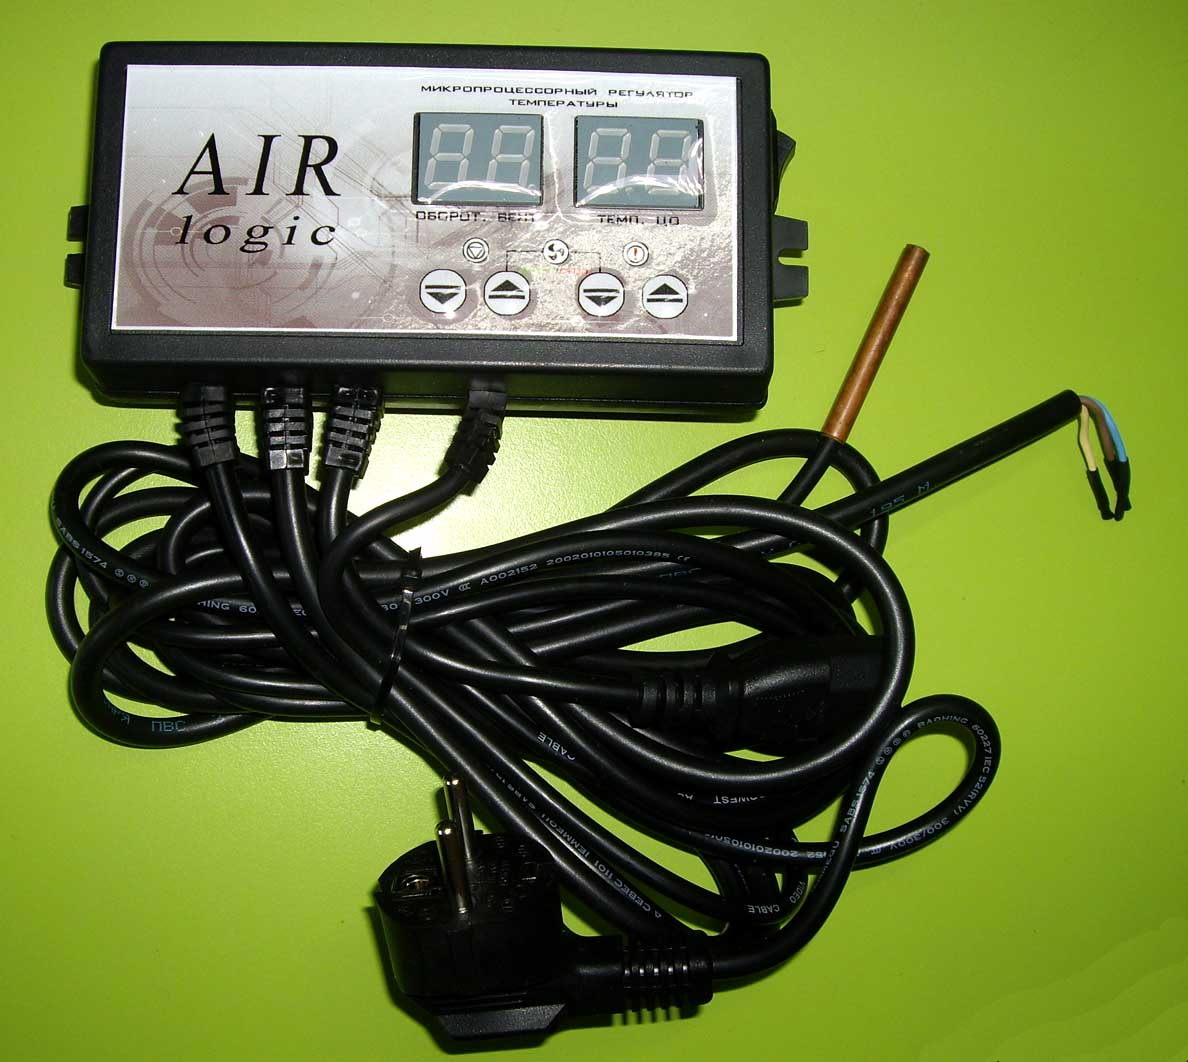 Блок управления вентилятора AIR logic MPT